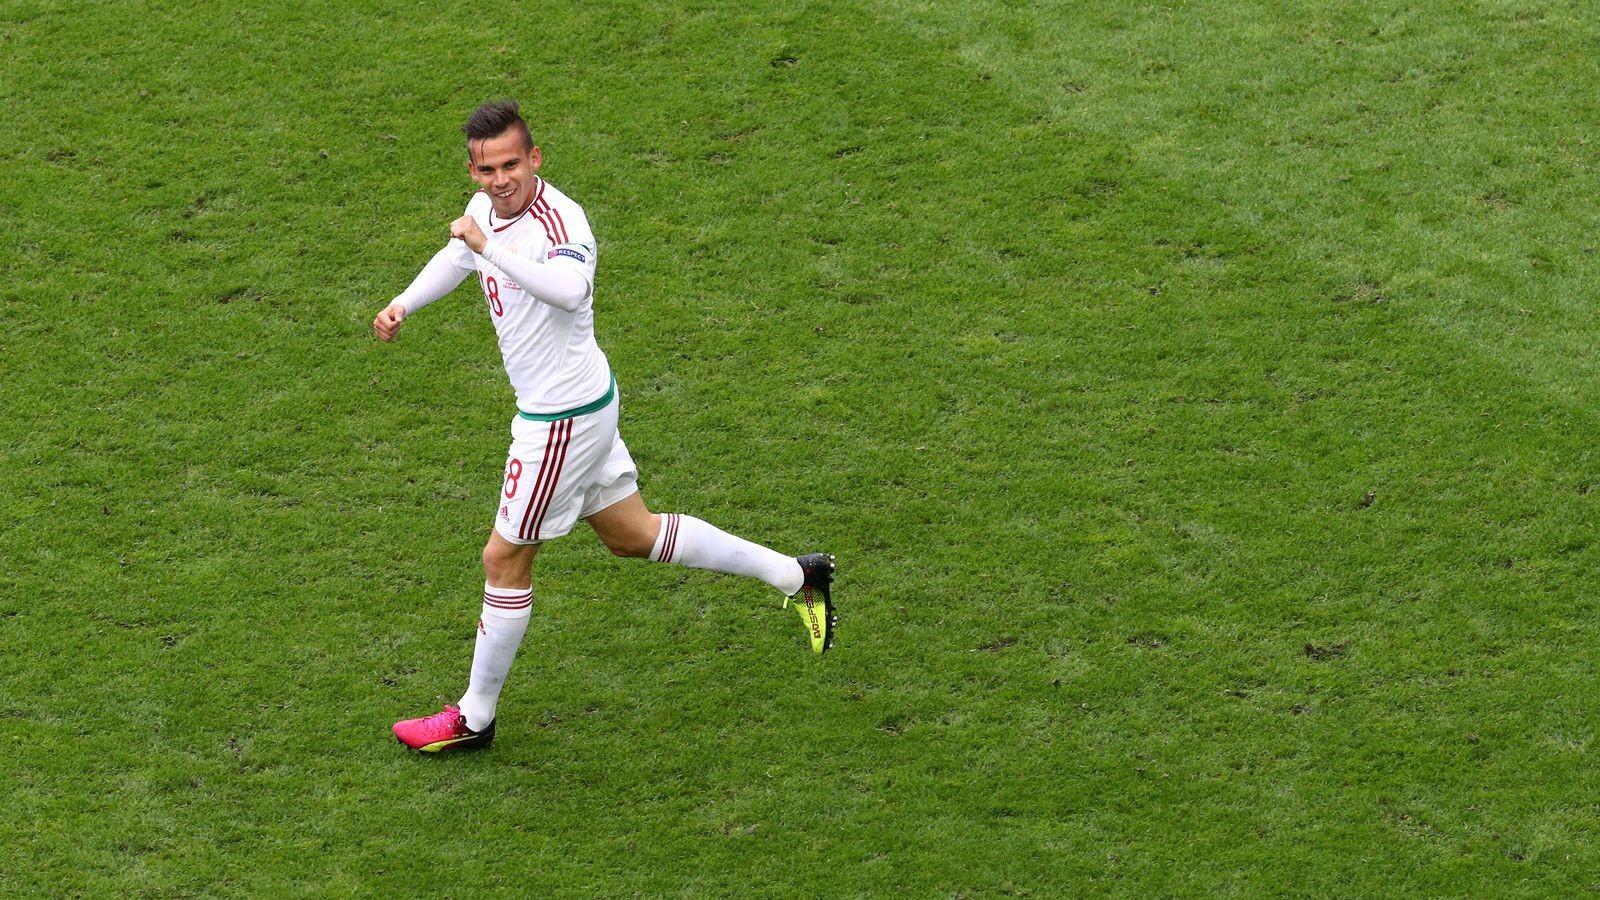 German report has Zoltan Stieber joining D.C. United